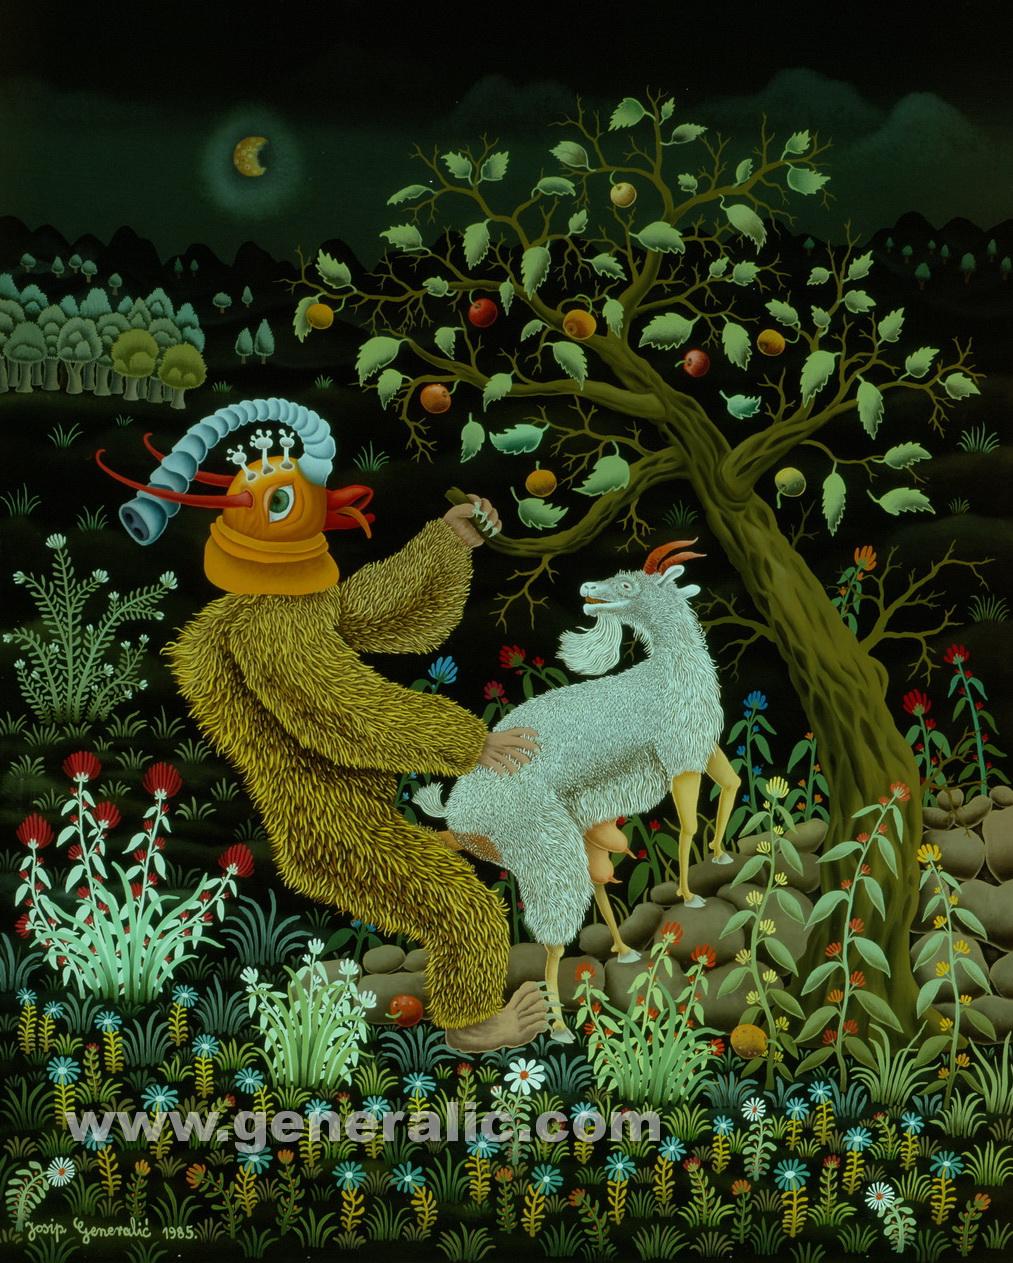 Josip Generalic, 1985, Goats pleasant surprise, oil on glass, 80×100 cm